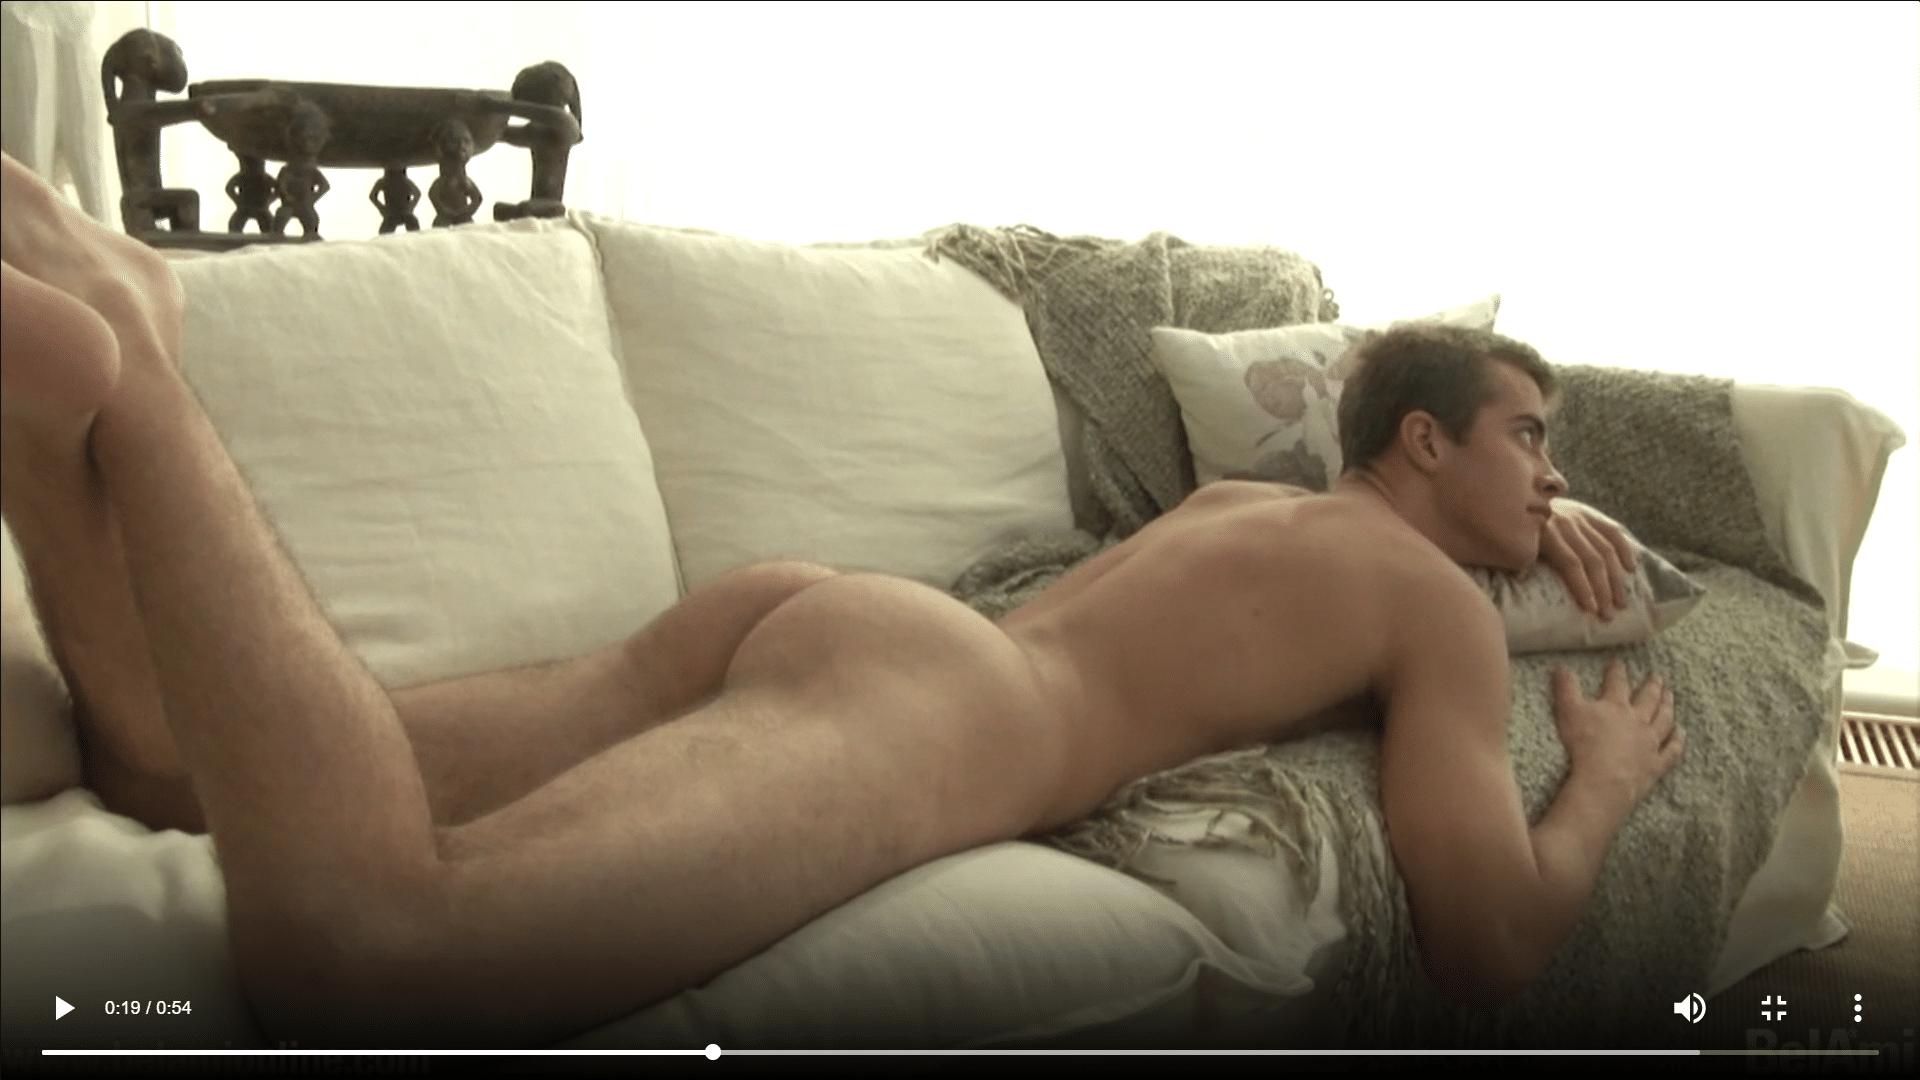 Newbie-Belami-boy-Jules-Bourget-strokes-stubby-thick-uncut-dick-spraying-jizz-six-pack-abs-13-gay-porn-pics